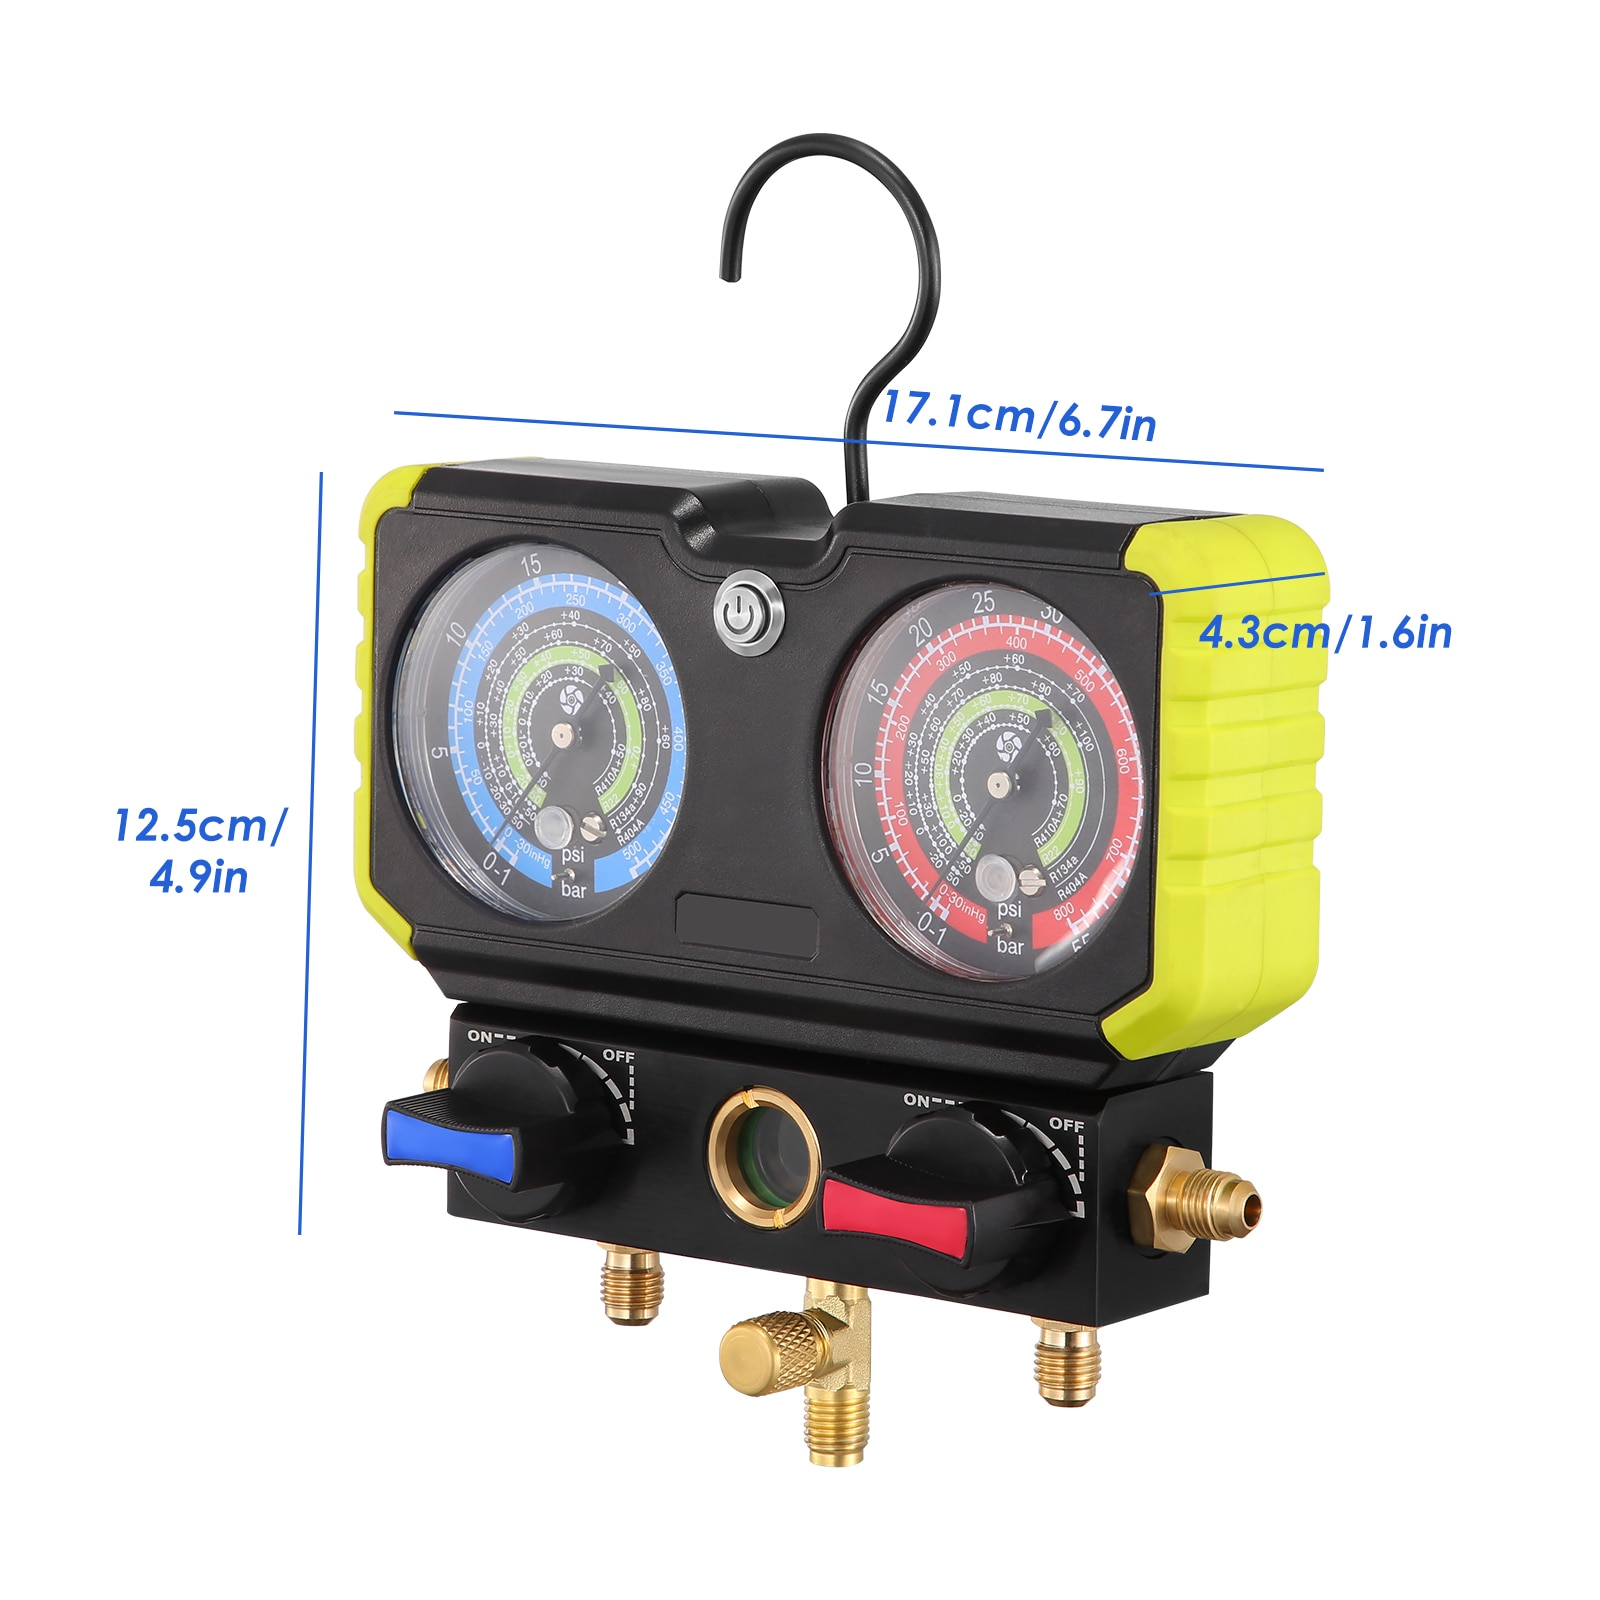 3Way AC Diagnostic Manifold Gauge Set For Freon Charging FitsR134A R410A R22Refrigerants With Upgraded Gauge Shell enlarge